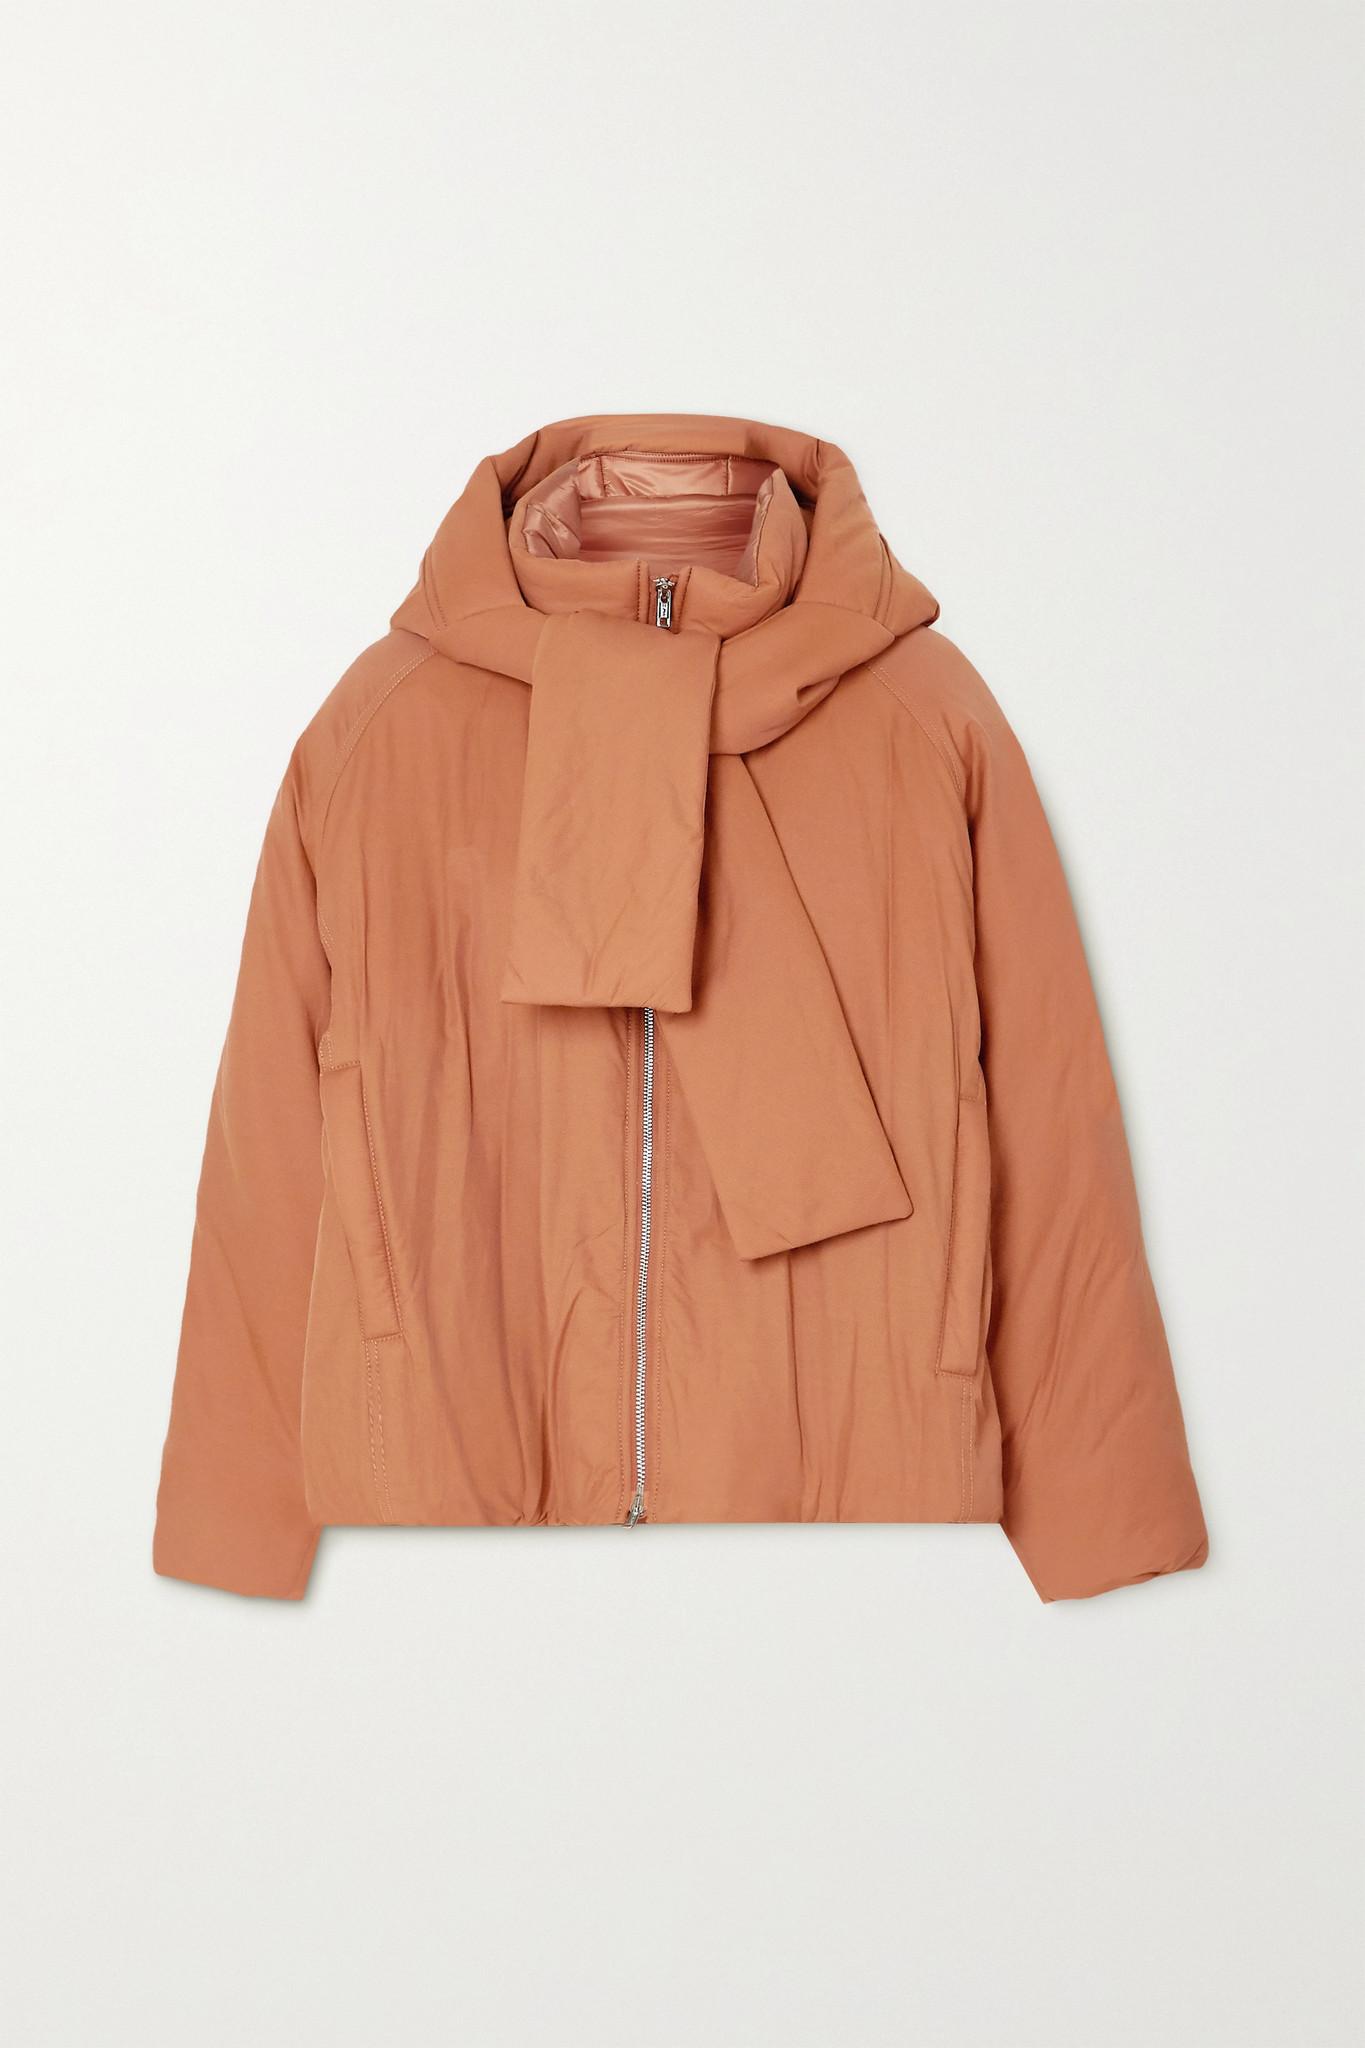 3.1 PHILLIP LIM - 系带细节带填充物棉质混纺软壳面料连帽夹克 - 棕色 - small